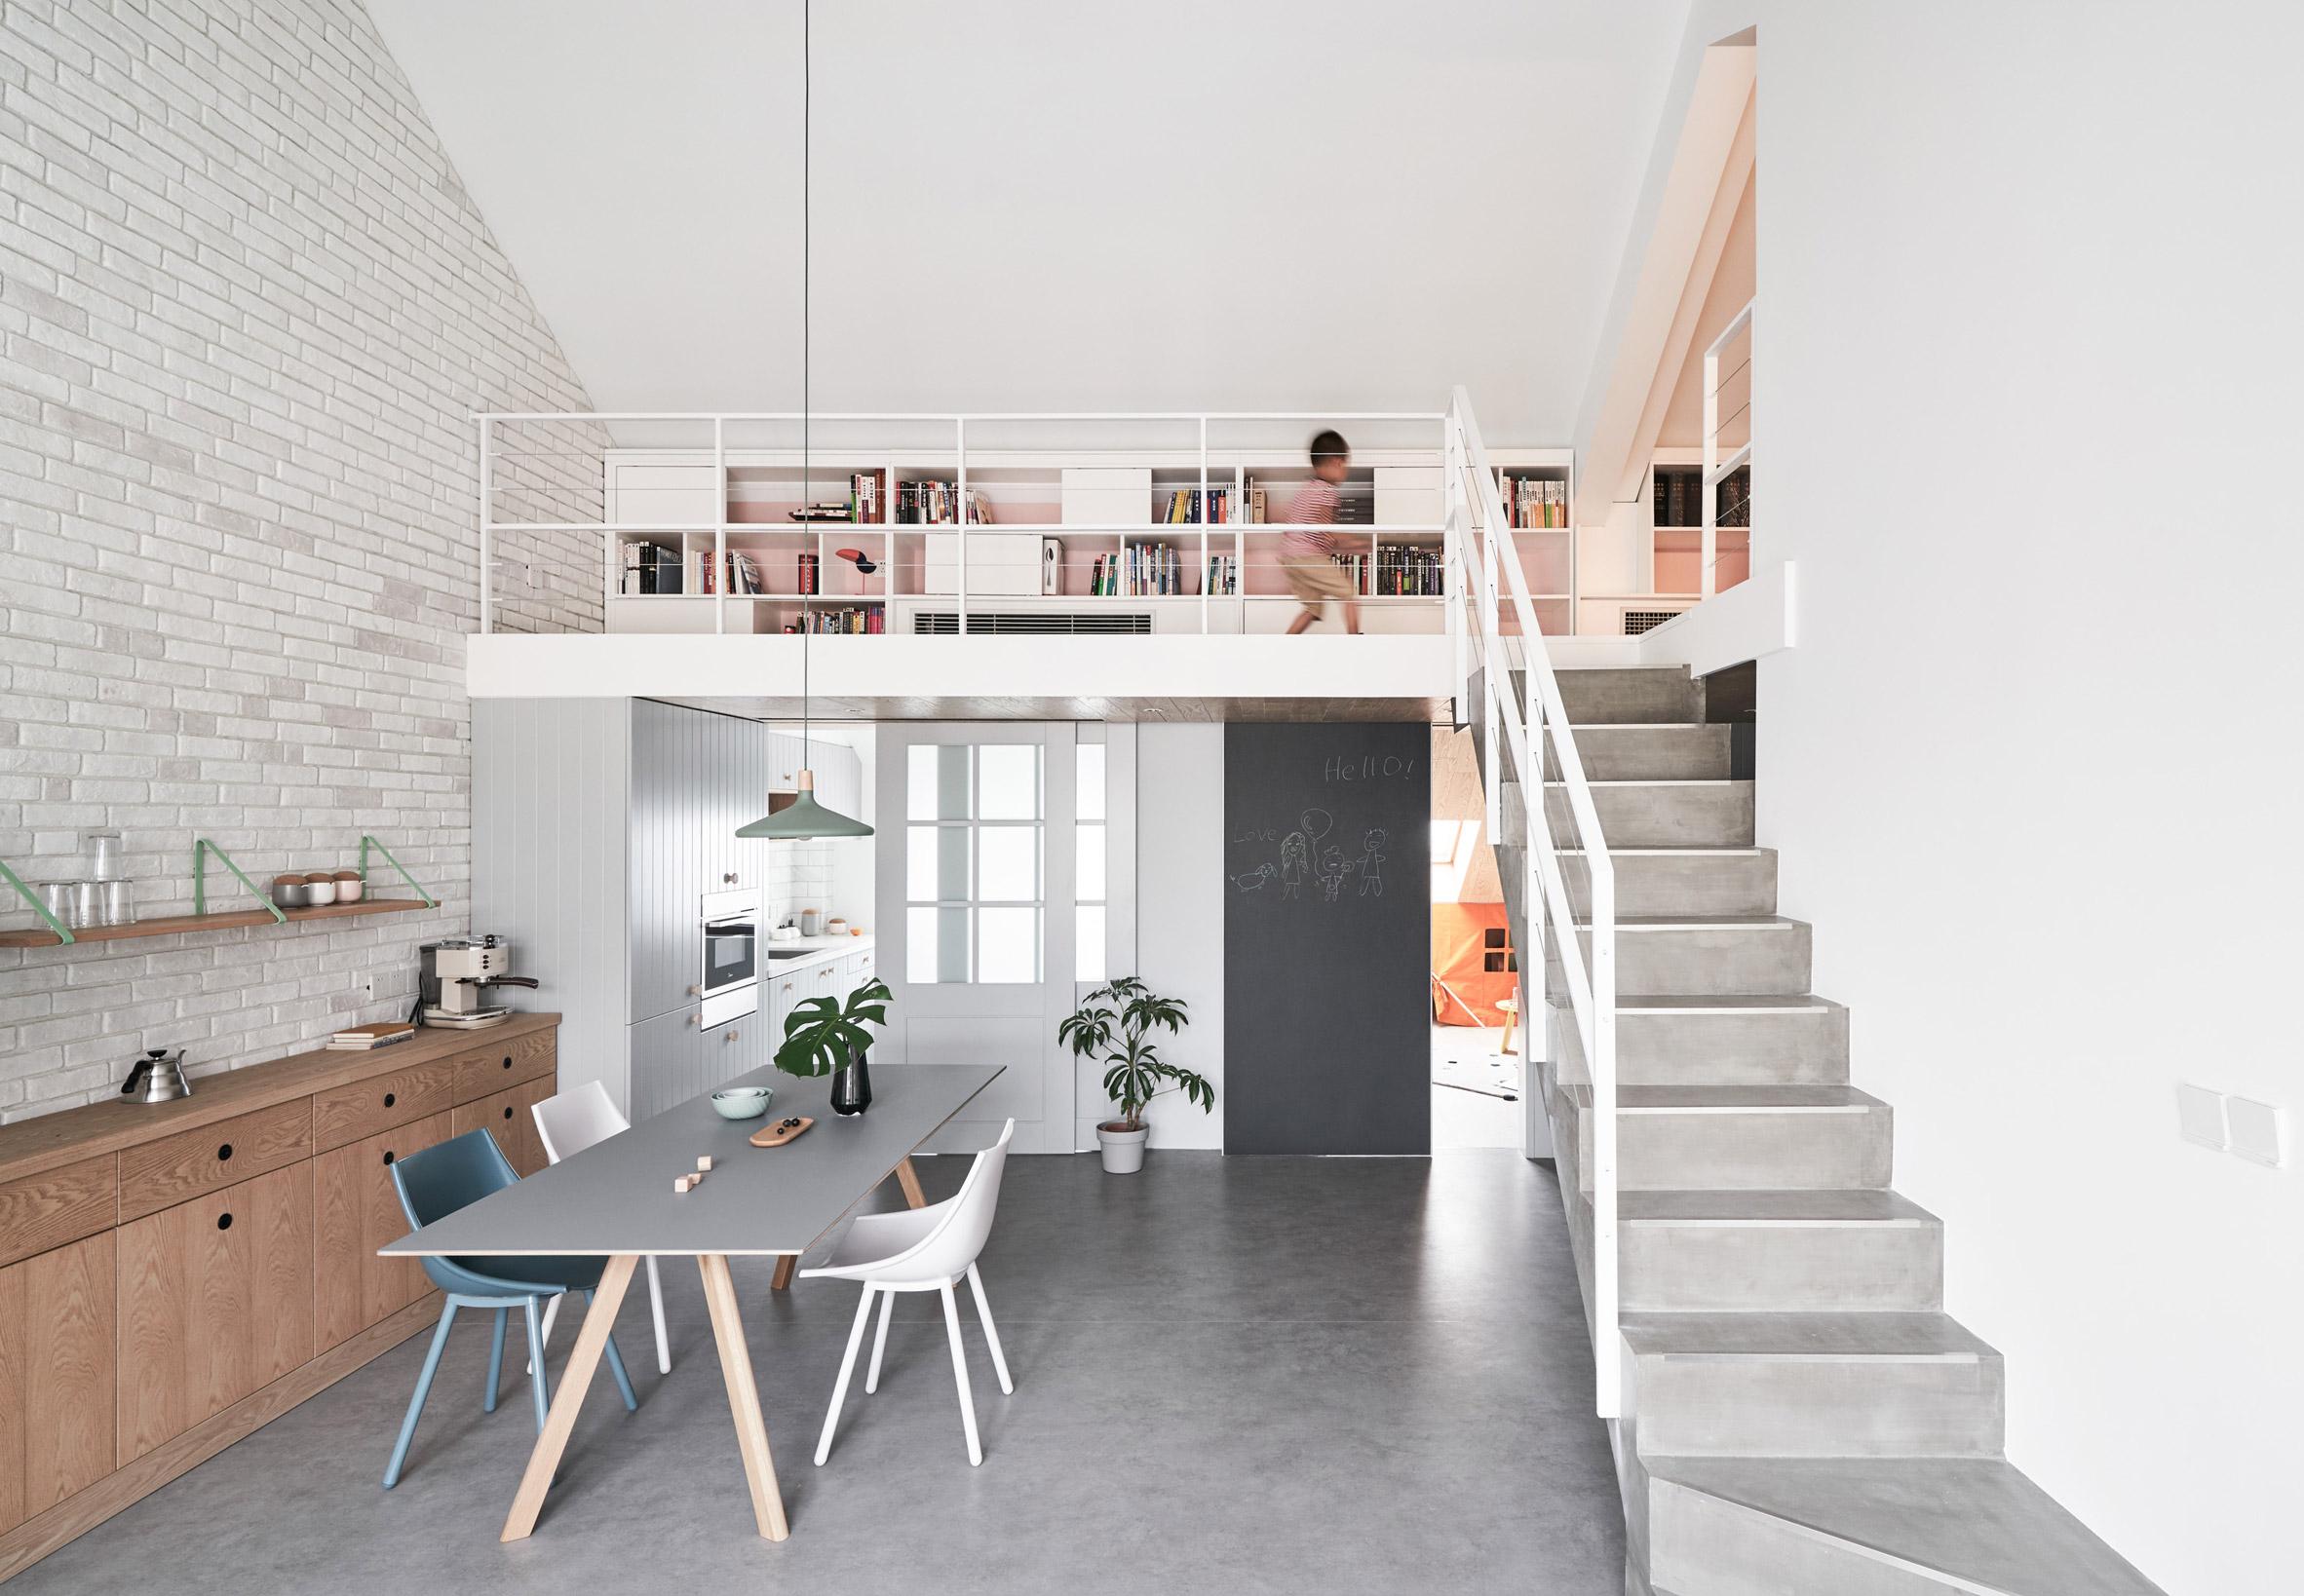 căn hộ cho gia đình trẻ starburst-house-hao-design-interiors-residential-china-beijing-elledecoration vietnam 7